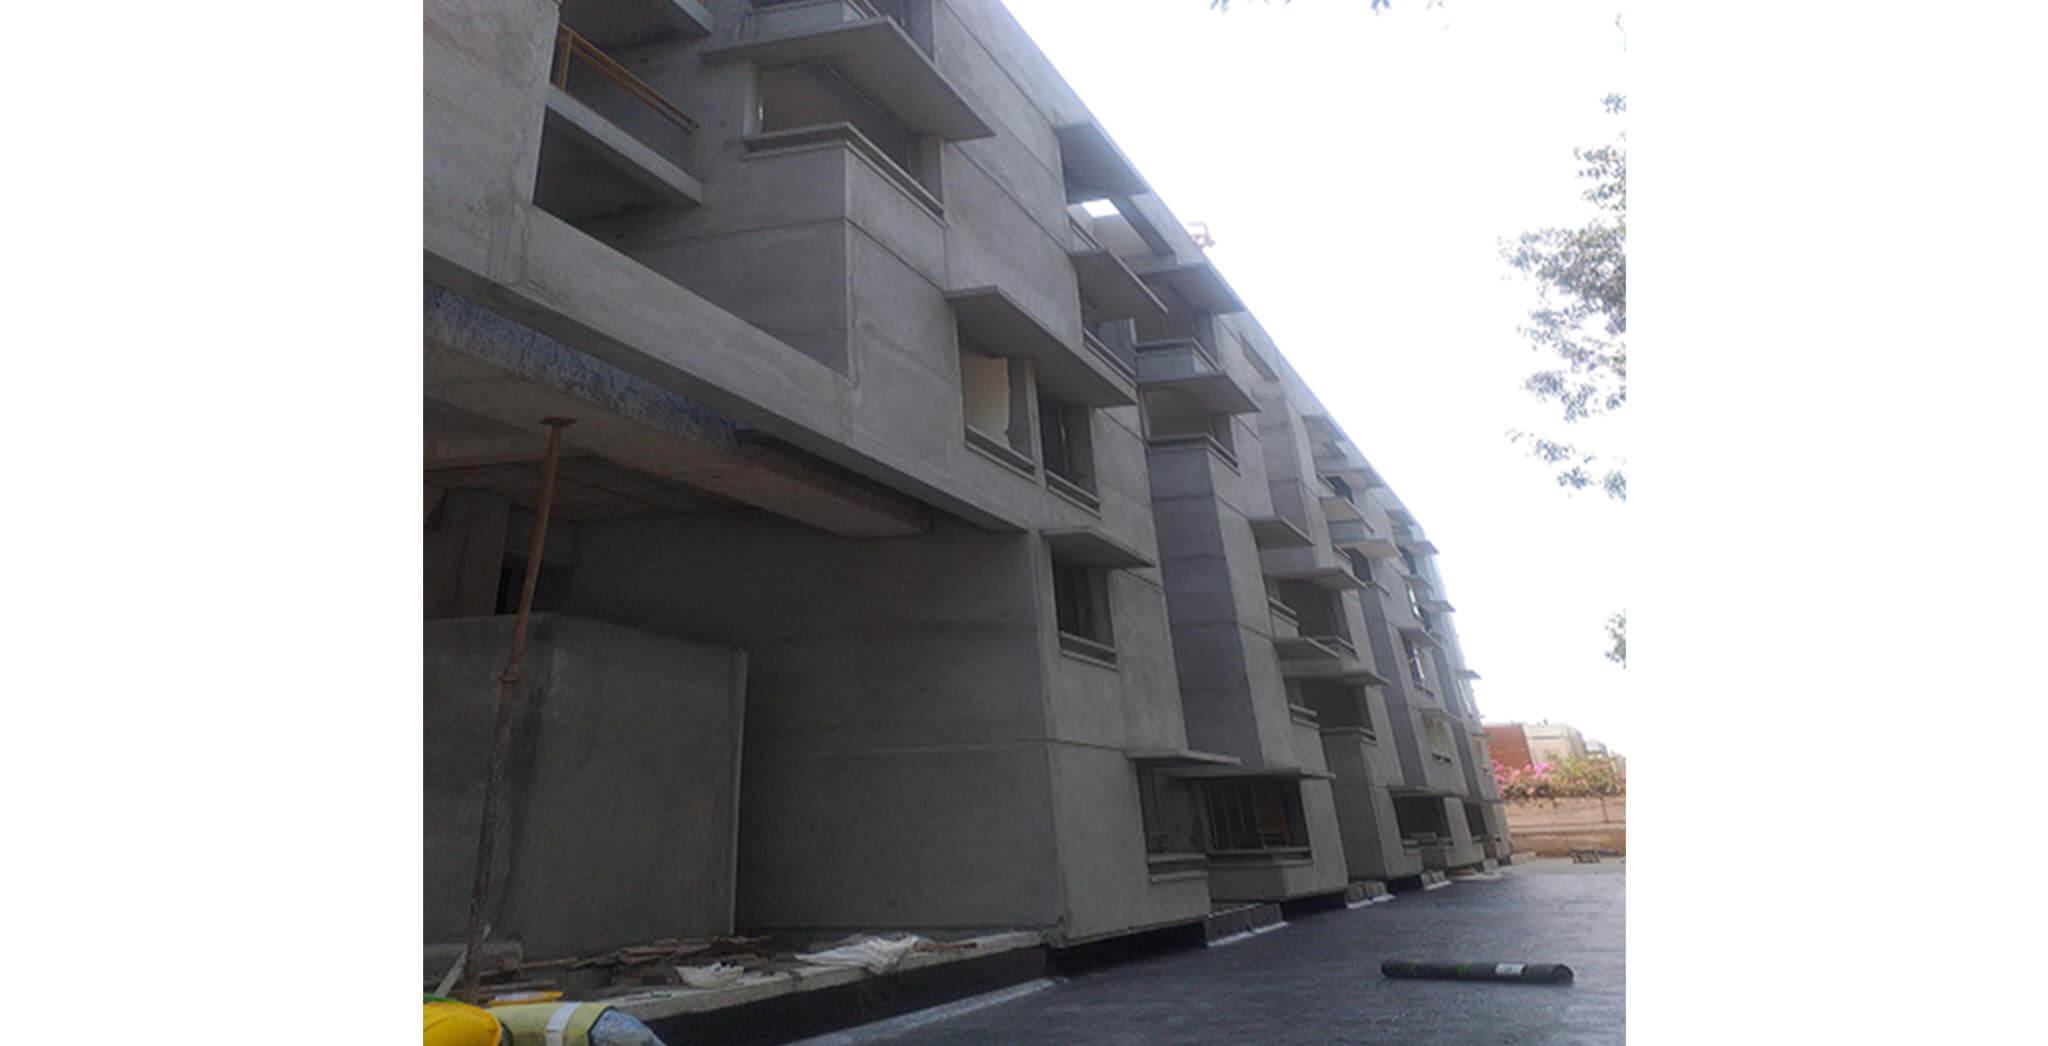 Feb 2021 - Towards West side view: L Block—Waterproofing work-in-progress at podium level